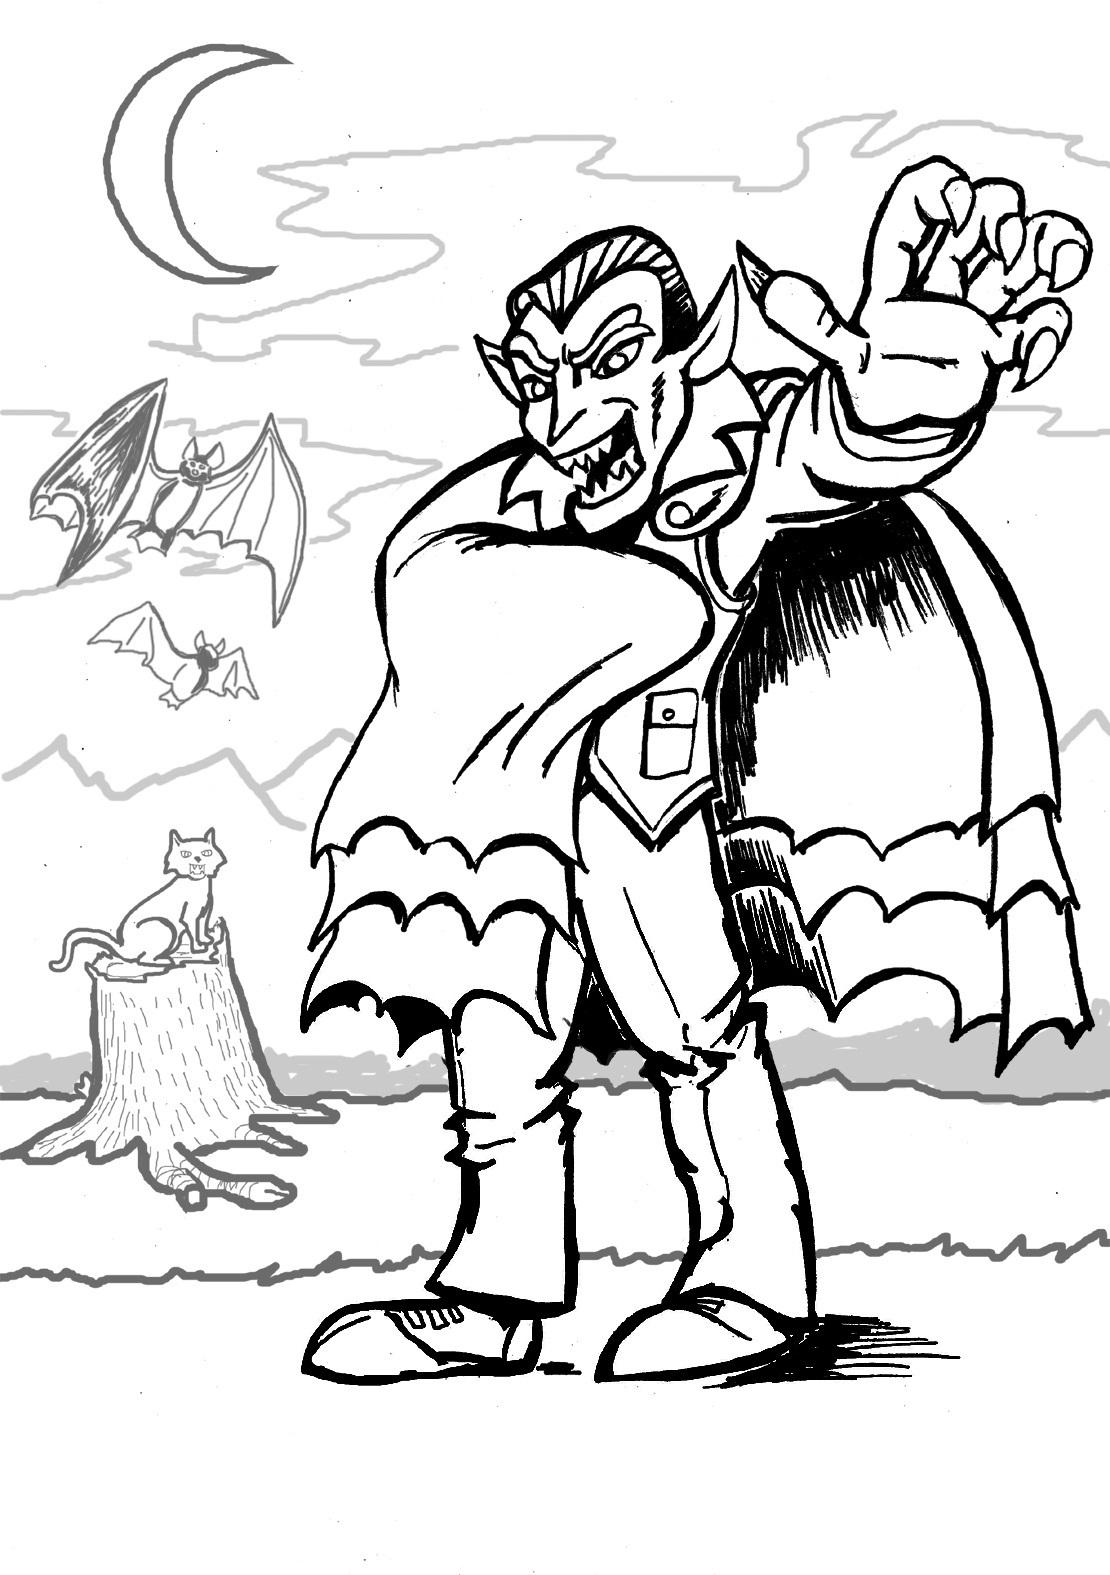 Vampire Drawing For Kids At Getdrawings